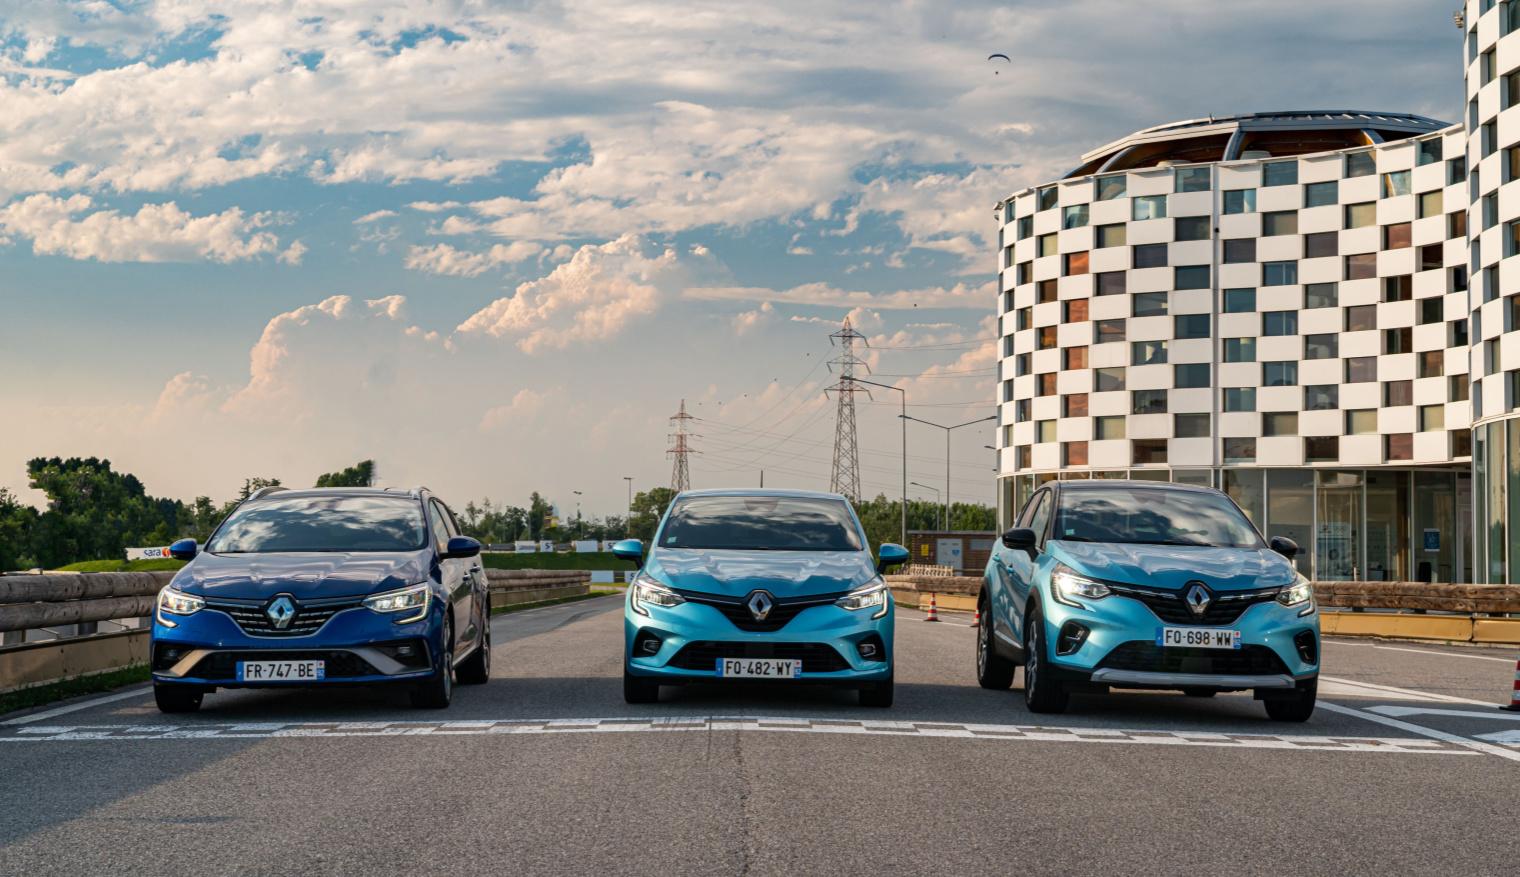 Test drive gamma Renault E-Tech